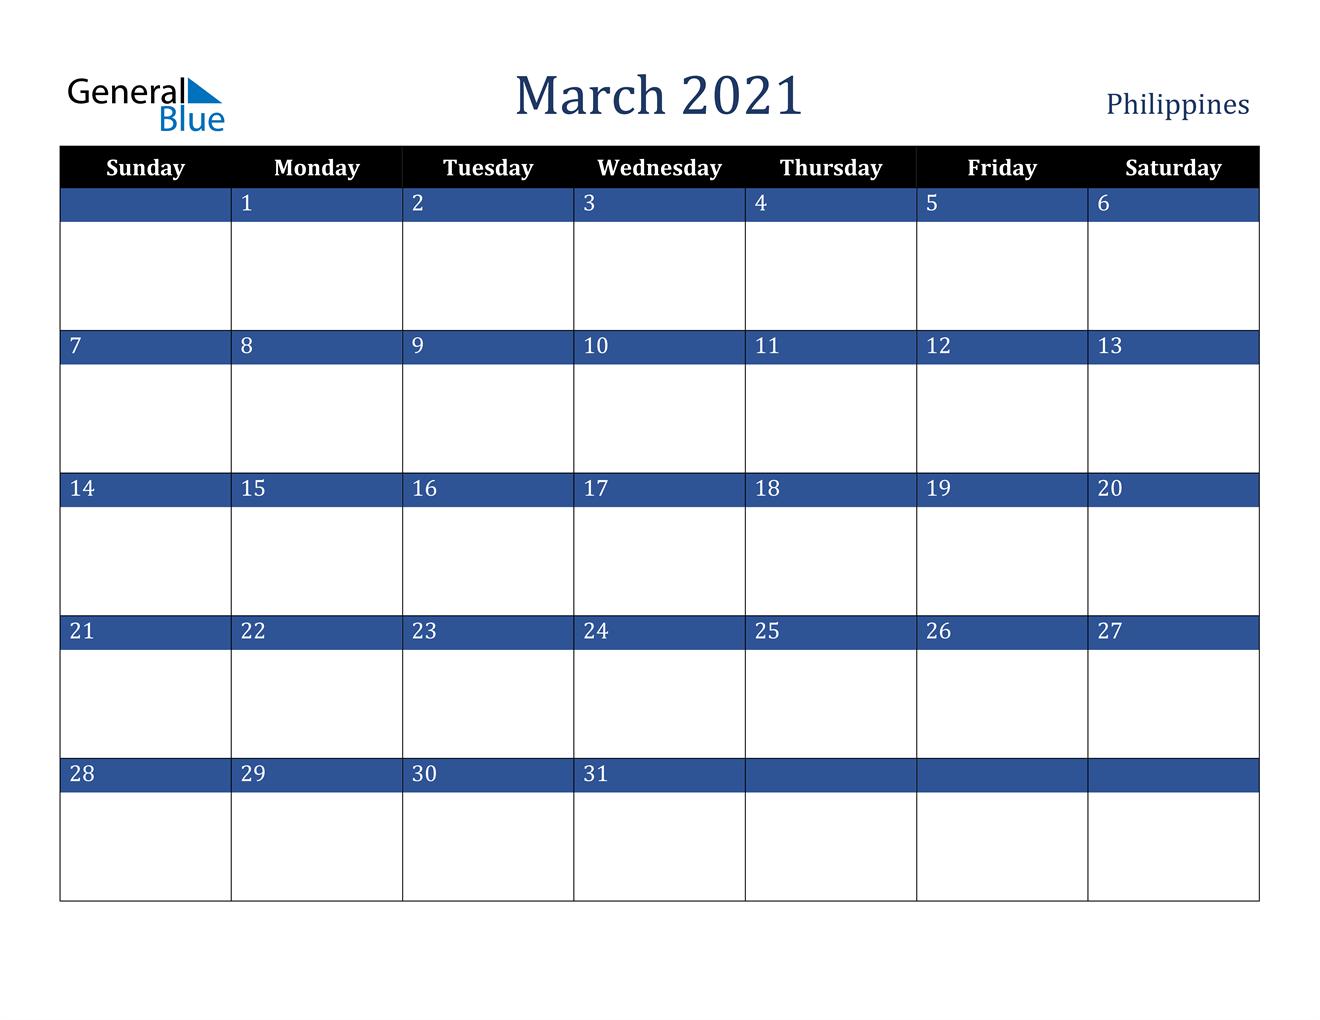 March 2021 Calendar - Philippines